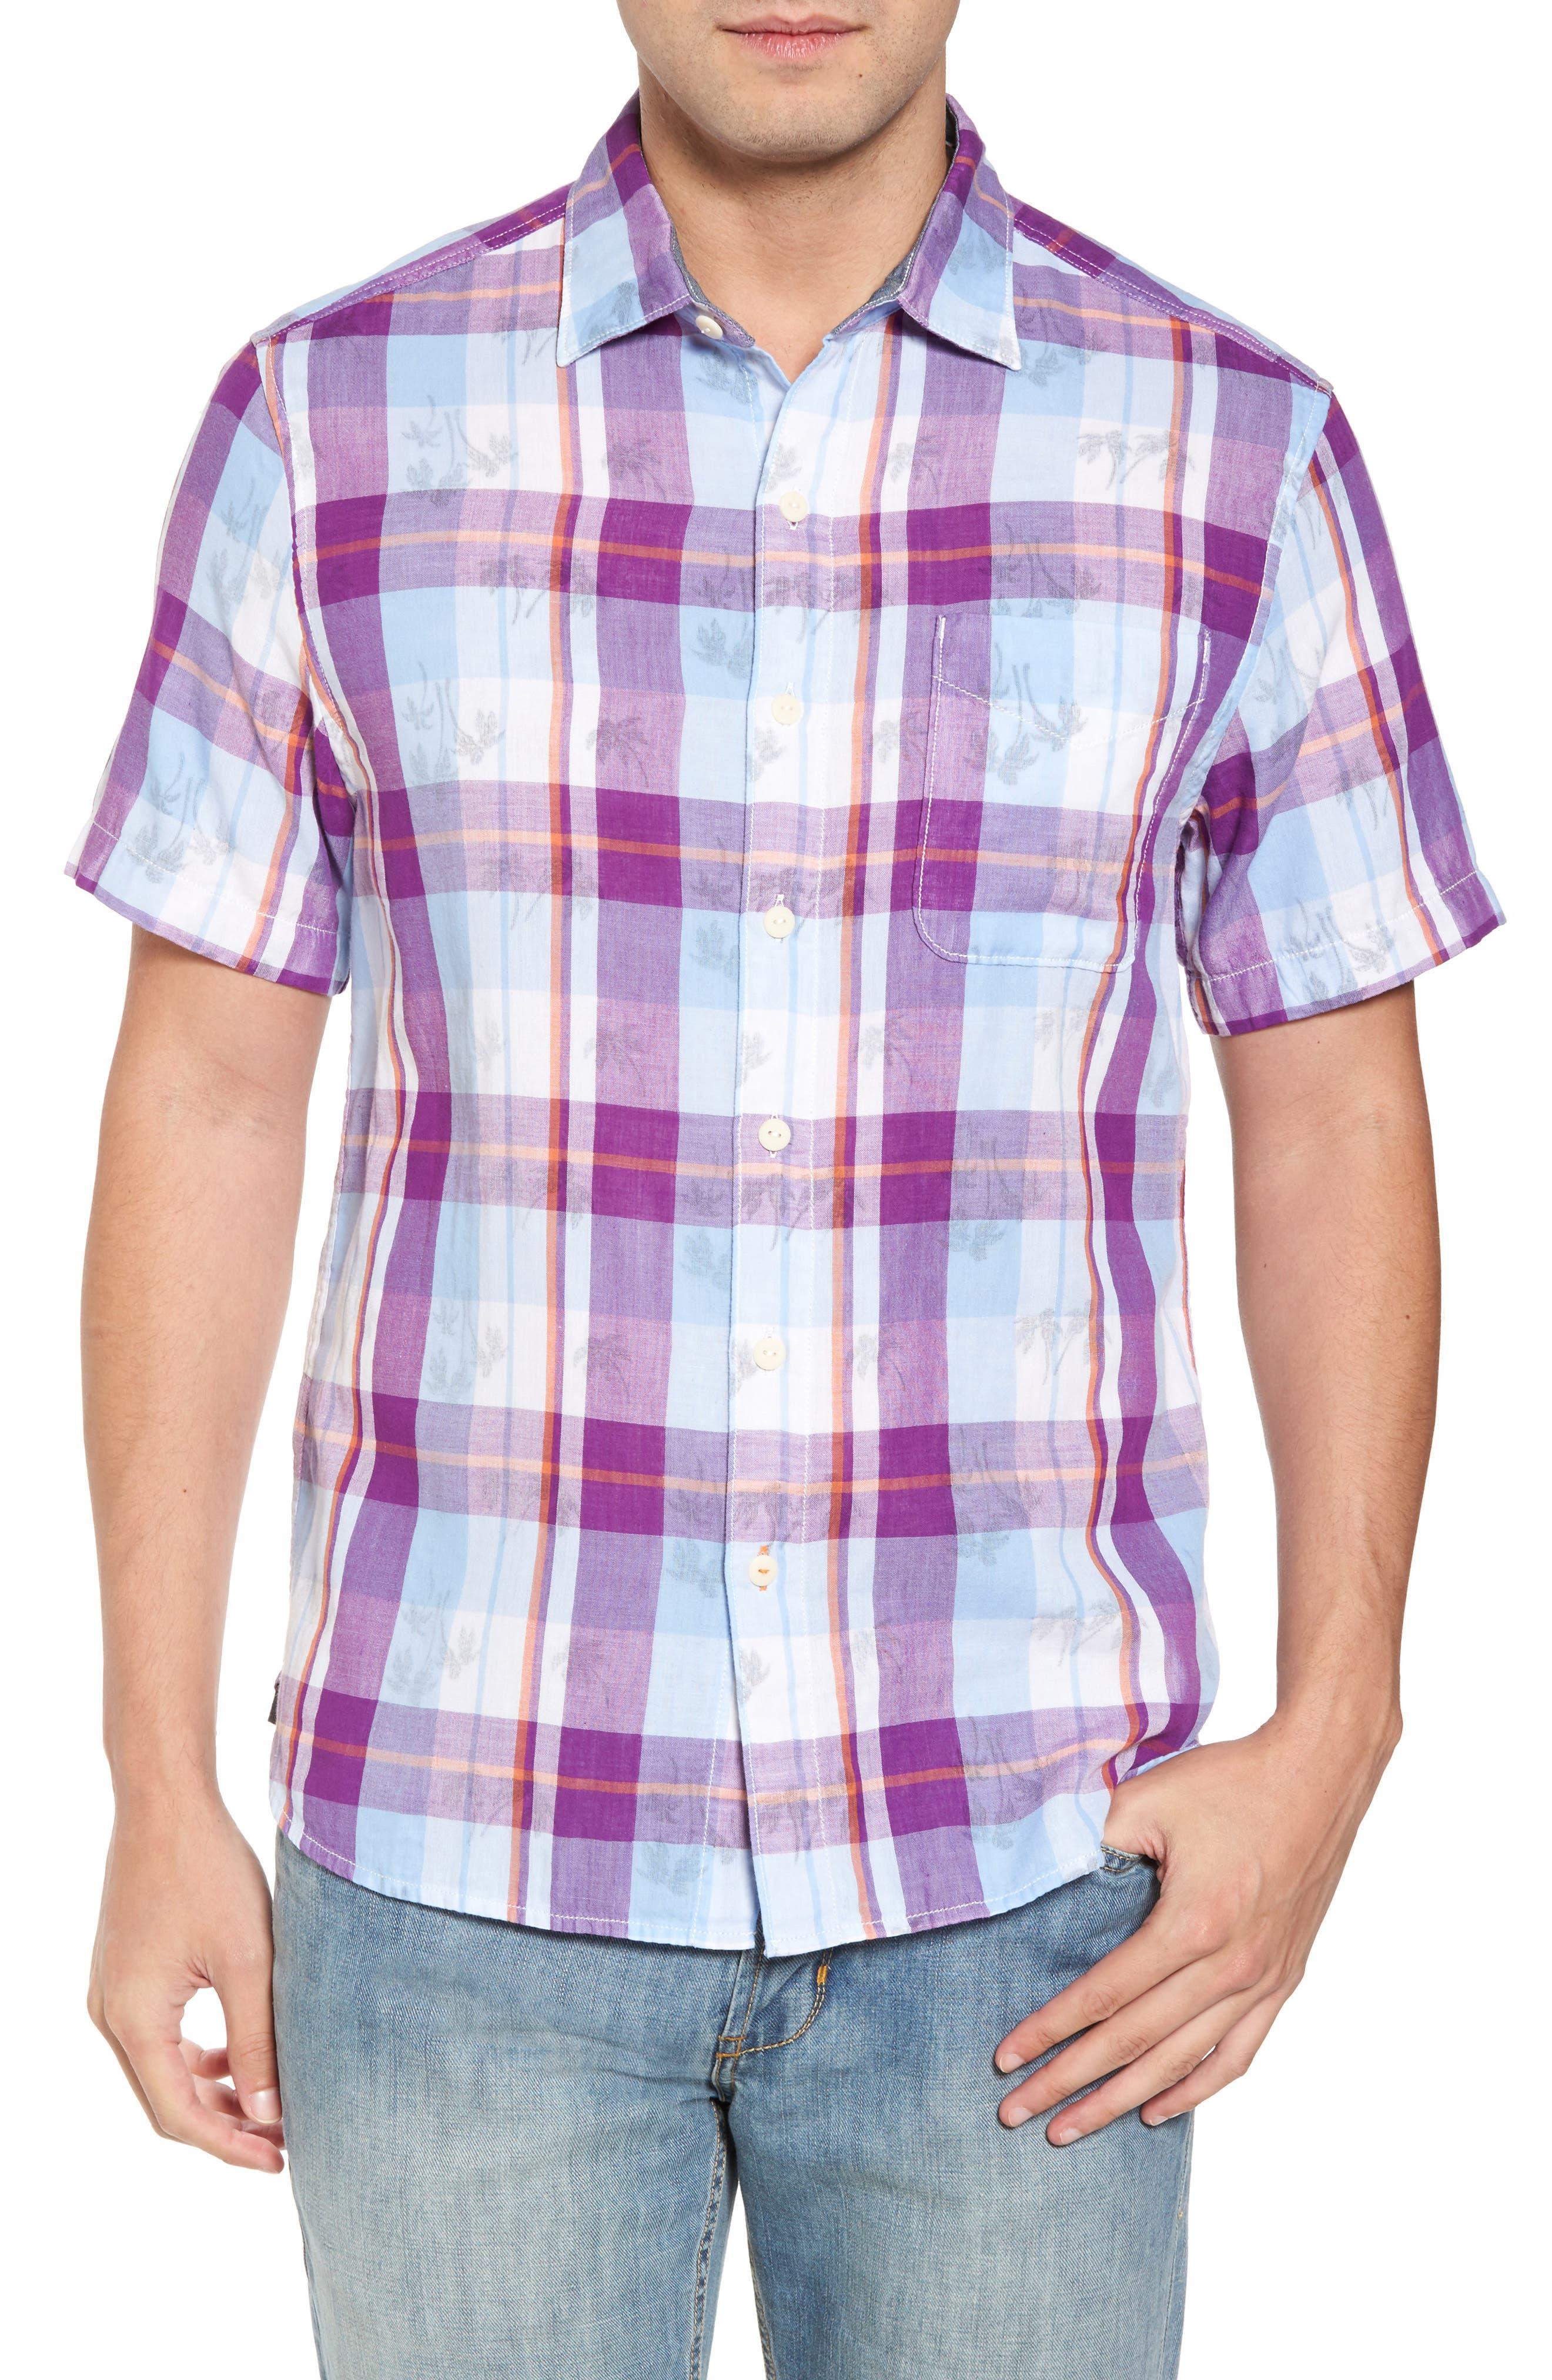 Main Image - Tommy Bahama Double Flora Plaid Cotton Camp Shirt